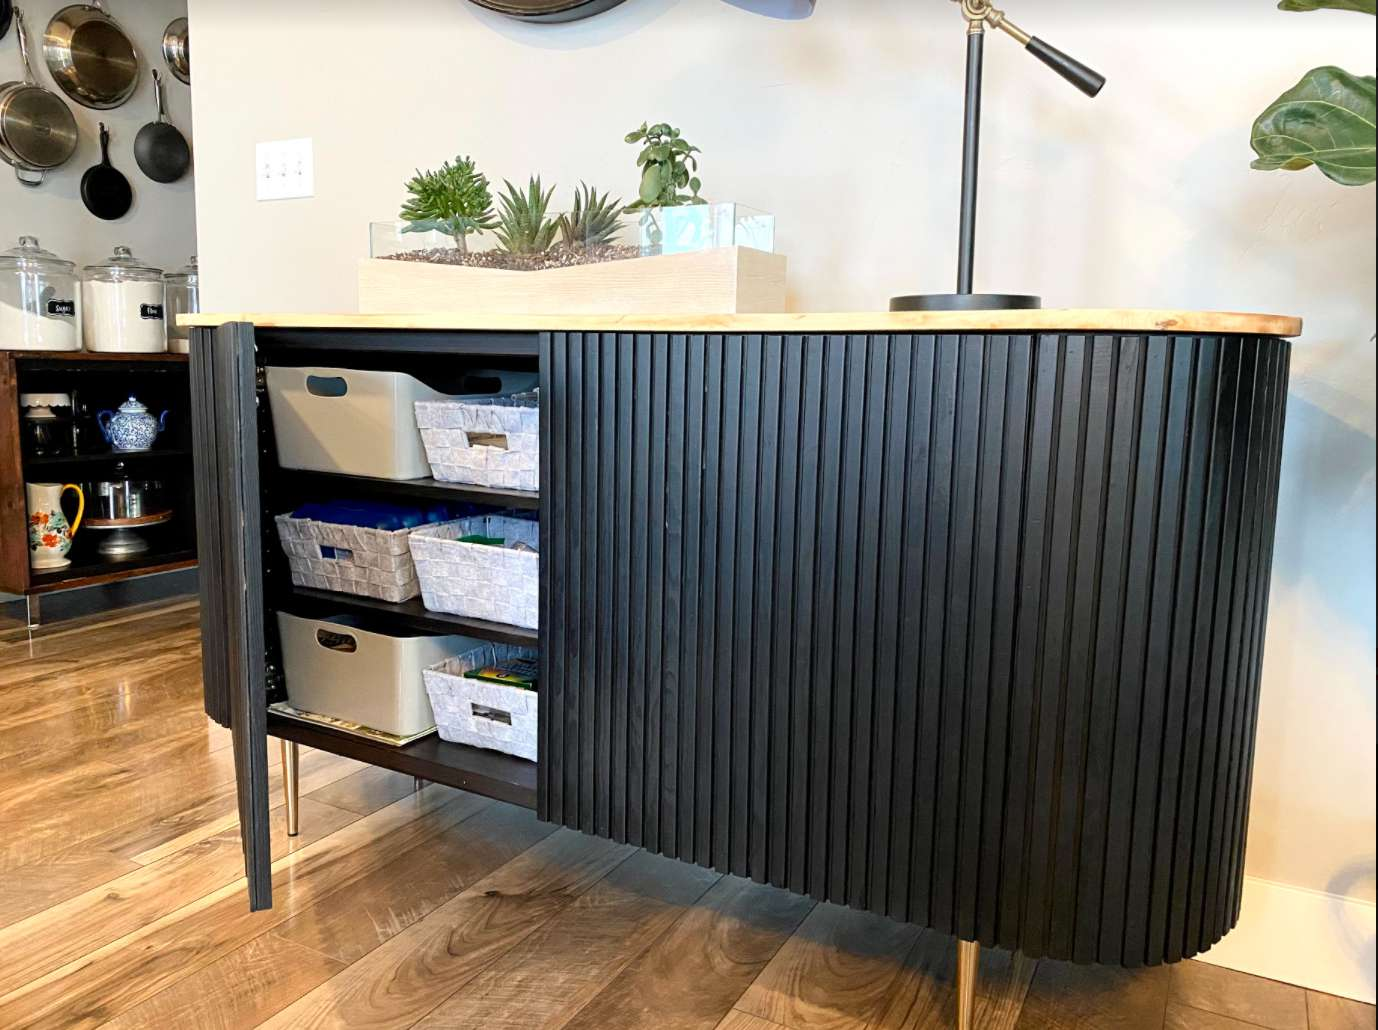 ikea hack, diy sideboard inspired by Crate & Barrel